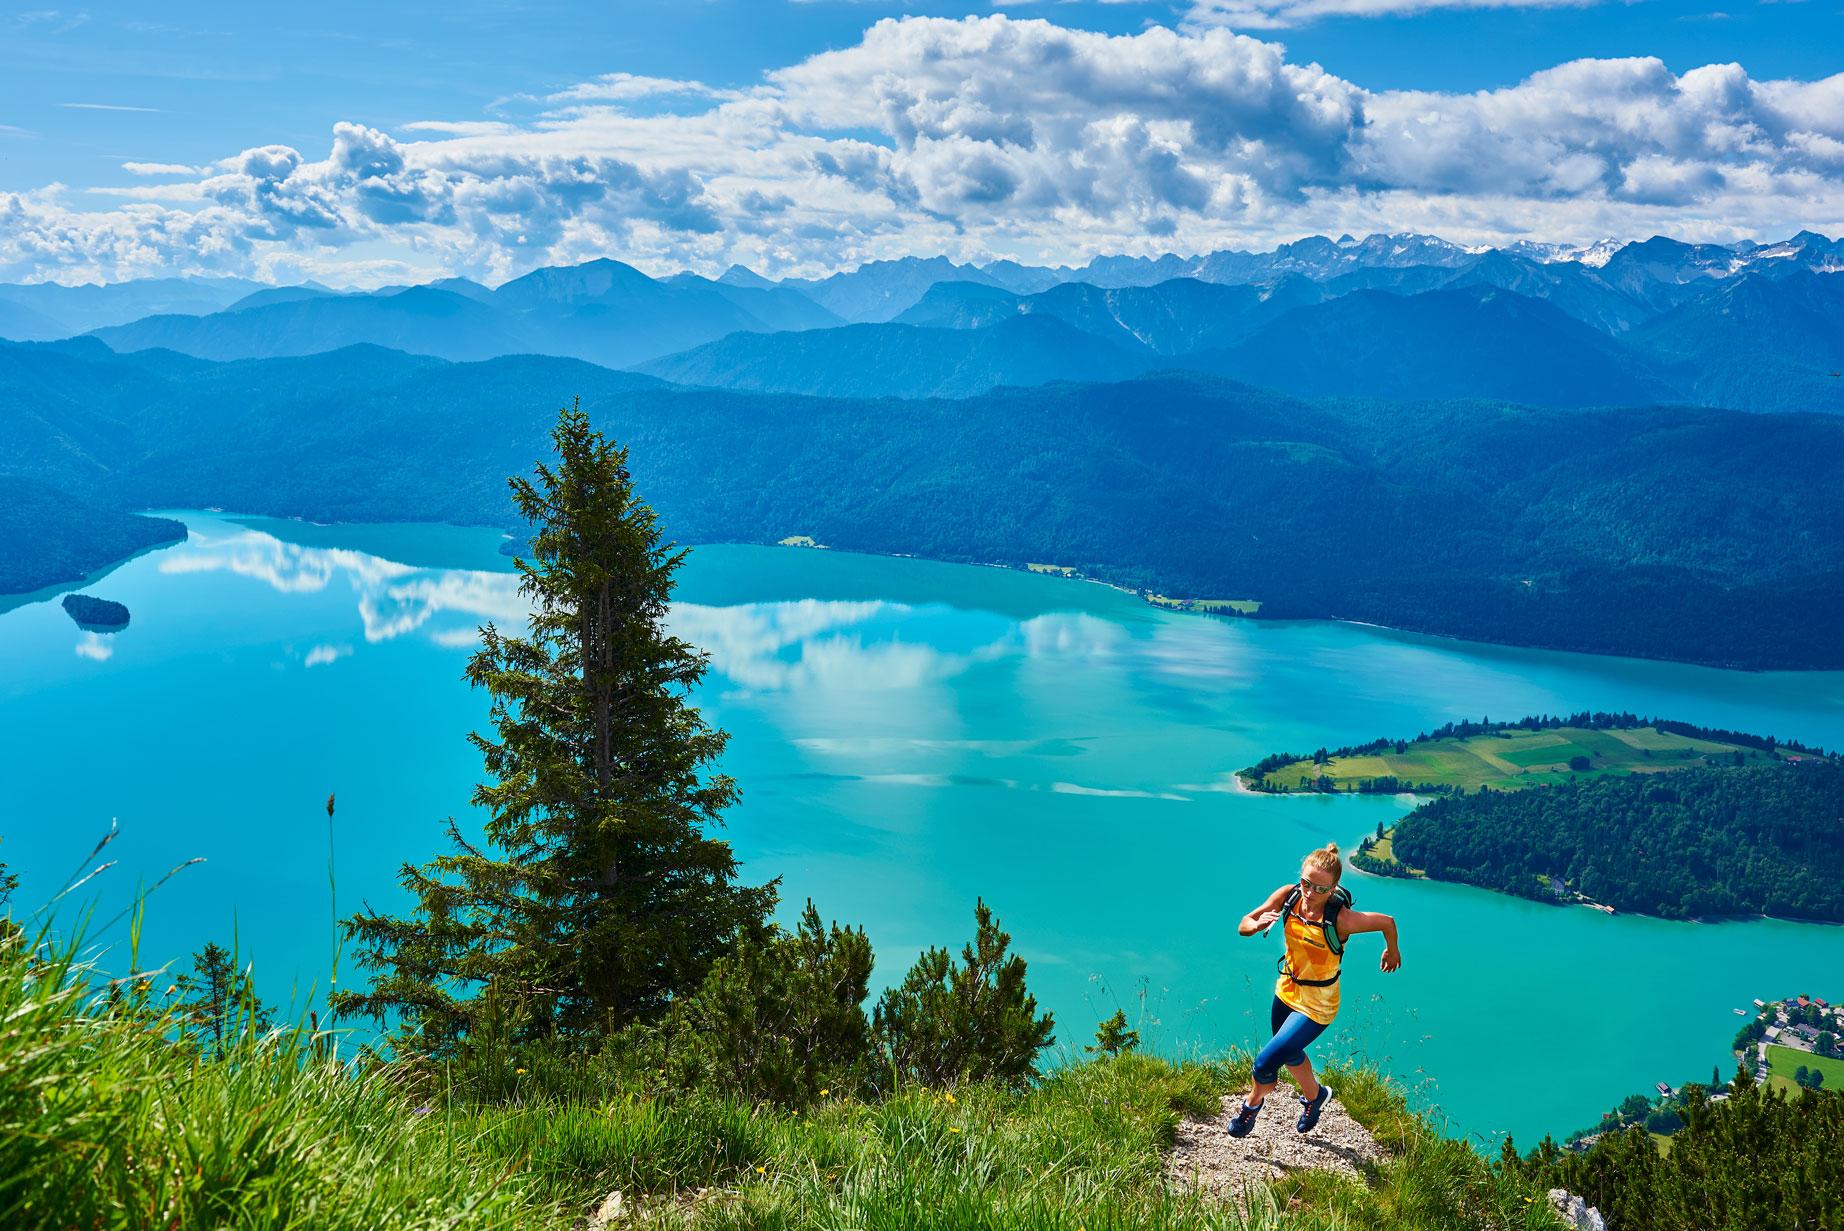 Michael_Reusse_Herzogstand_munichmountaingirls-trailrunning_Running_Caja-Schoepf